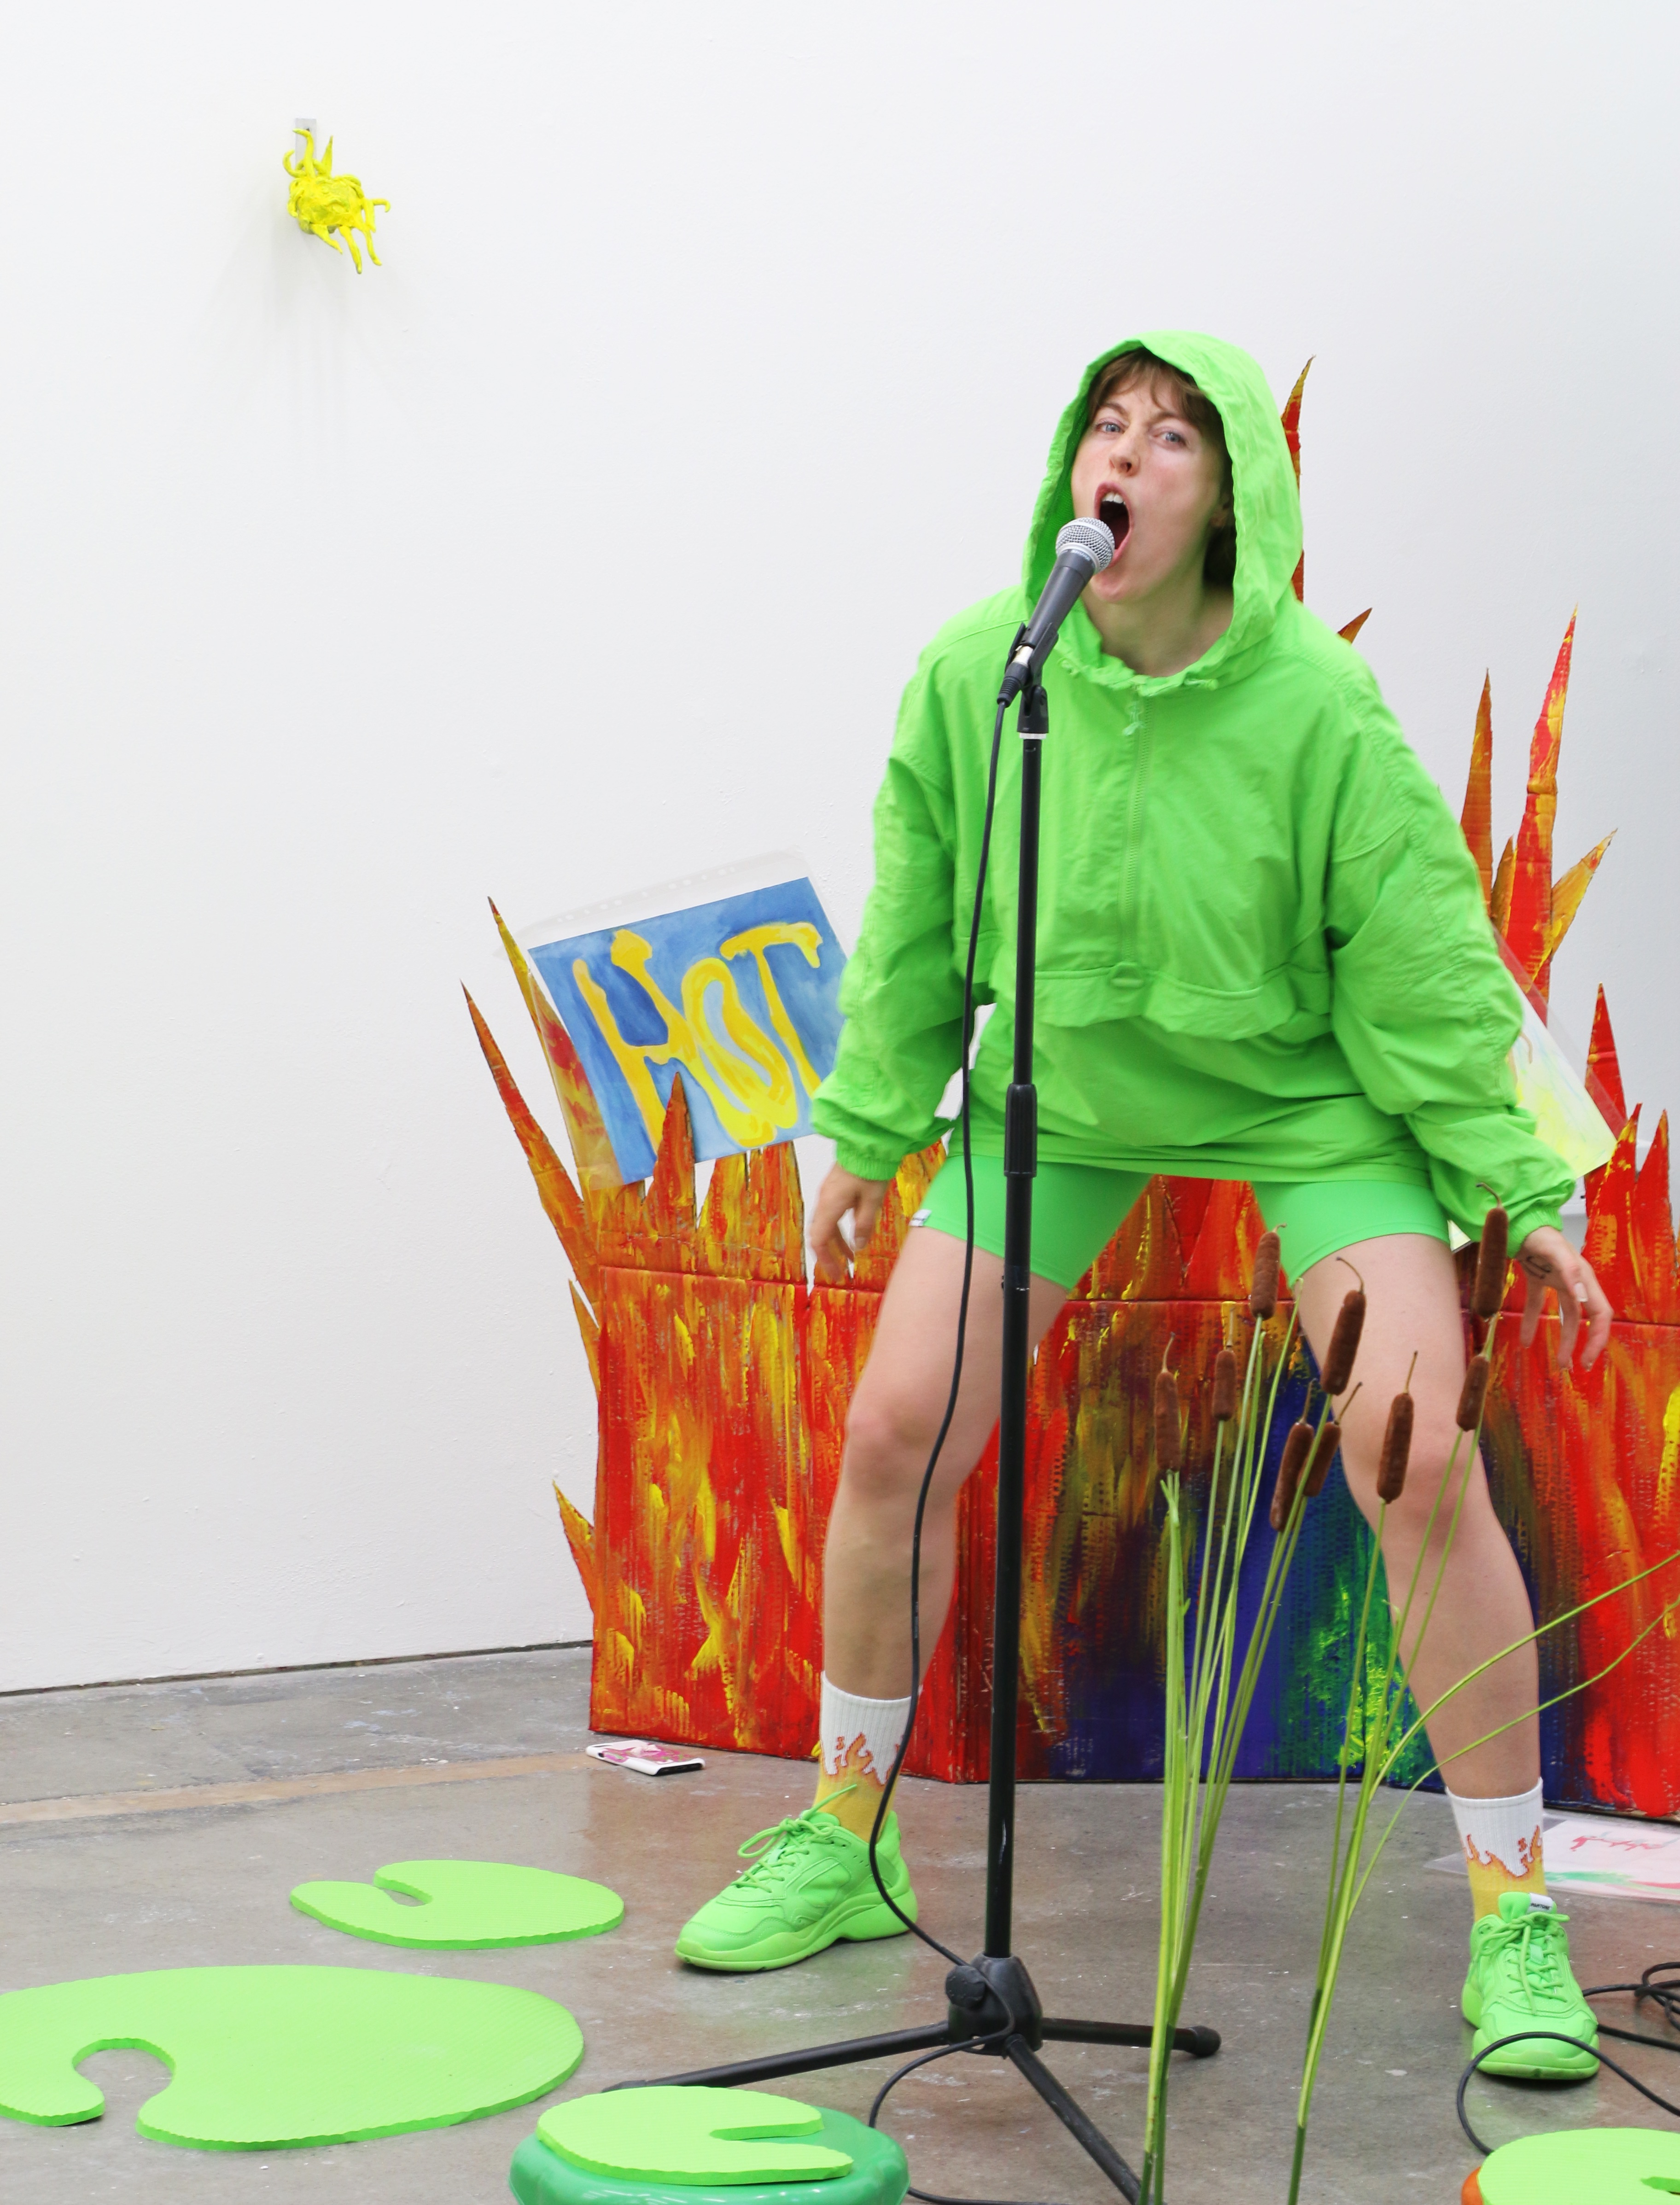 Anna Frijstein, HoPPy DaZe_Boiling Frog Syndrome_live, 2019, Performance shot, by Alexander Robertson